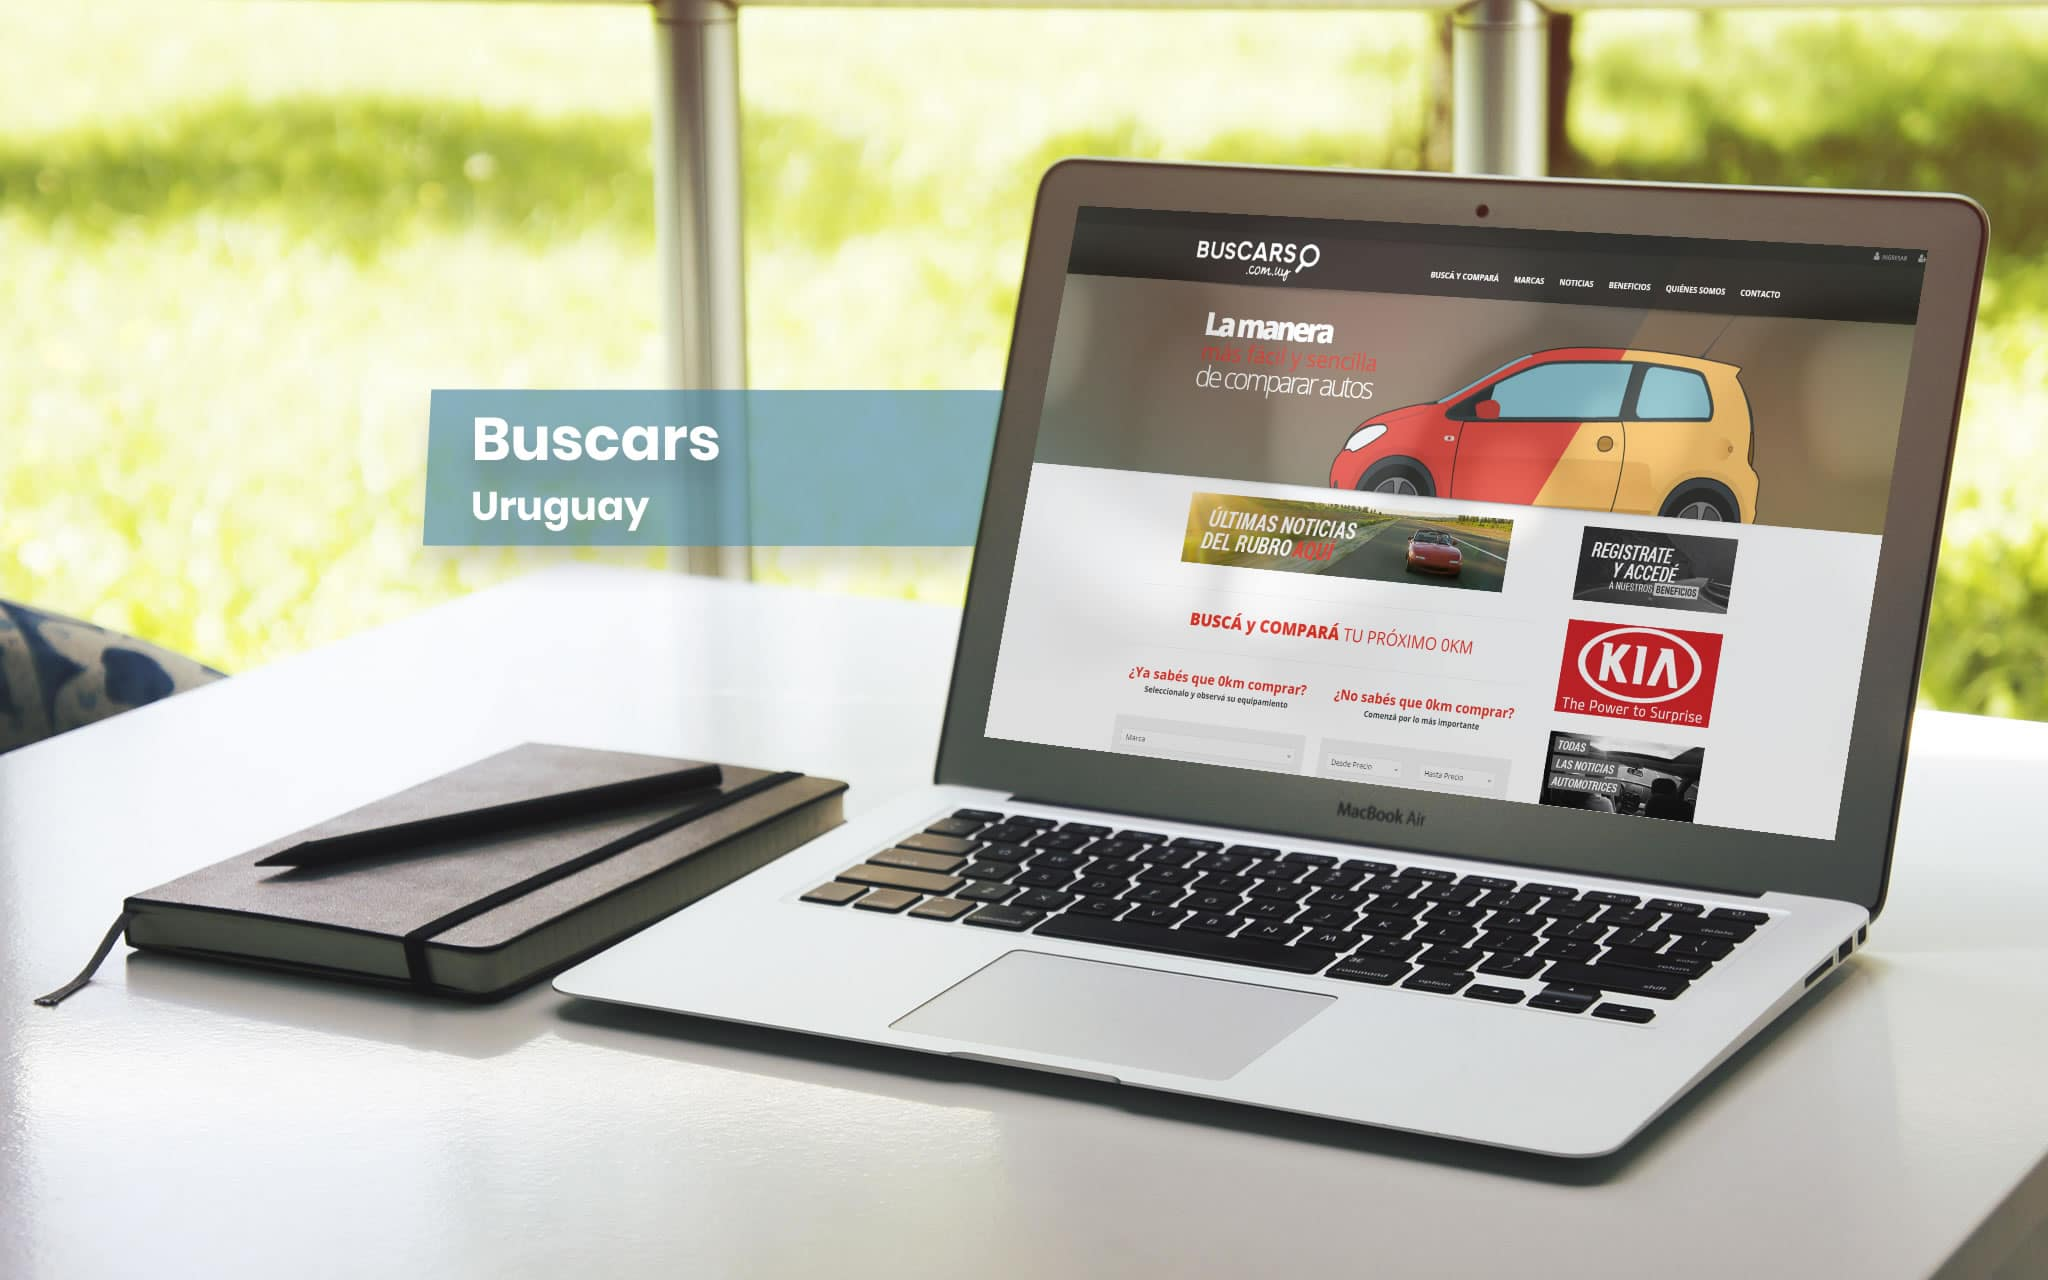 Buscars - Uruguay